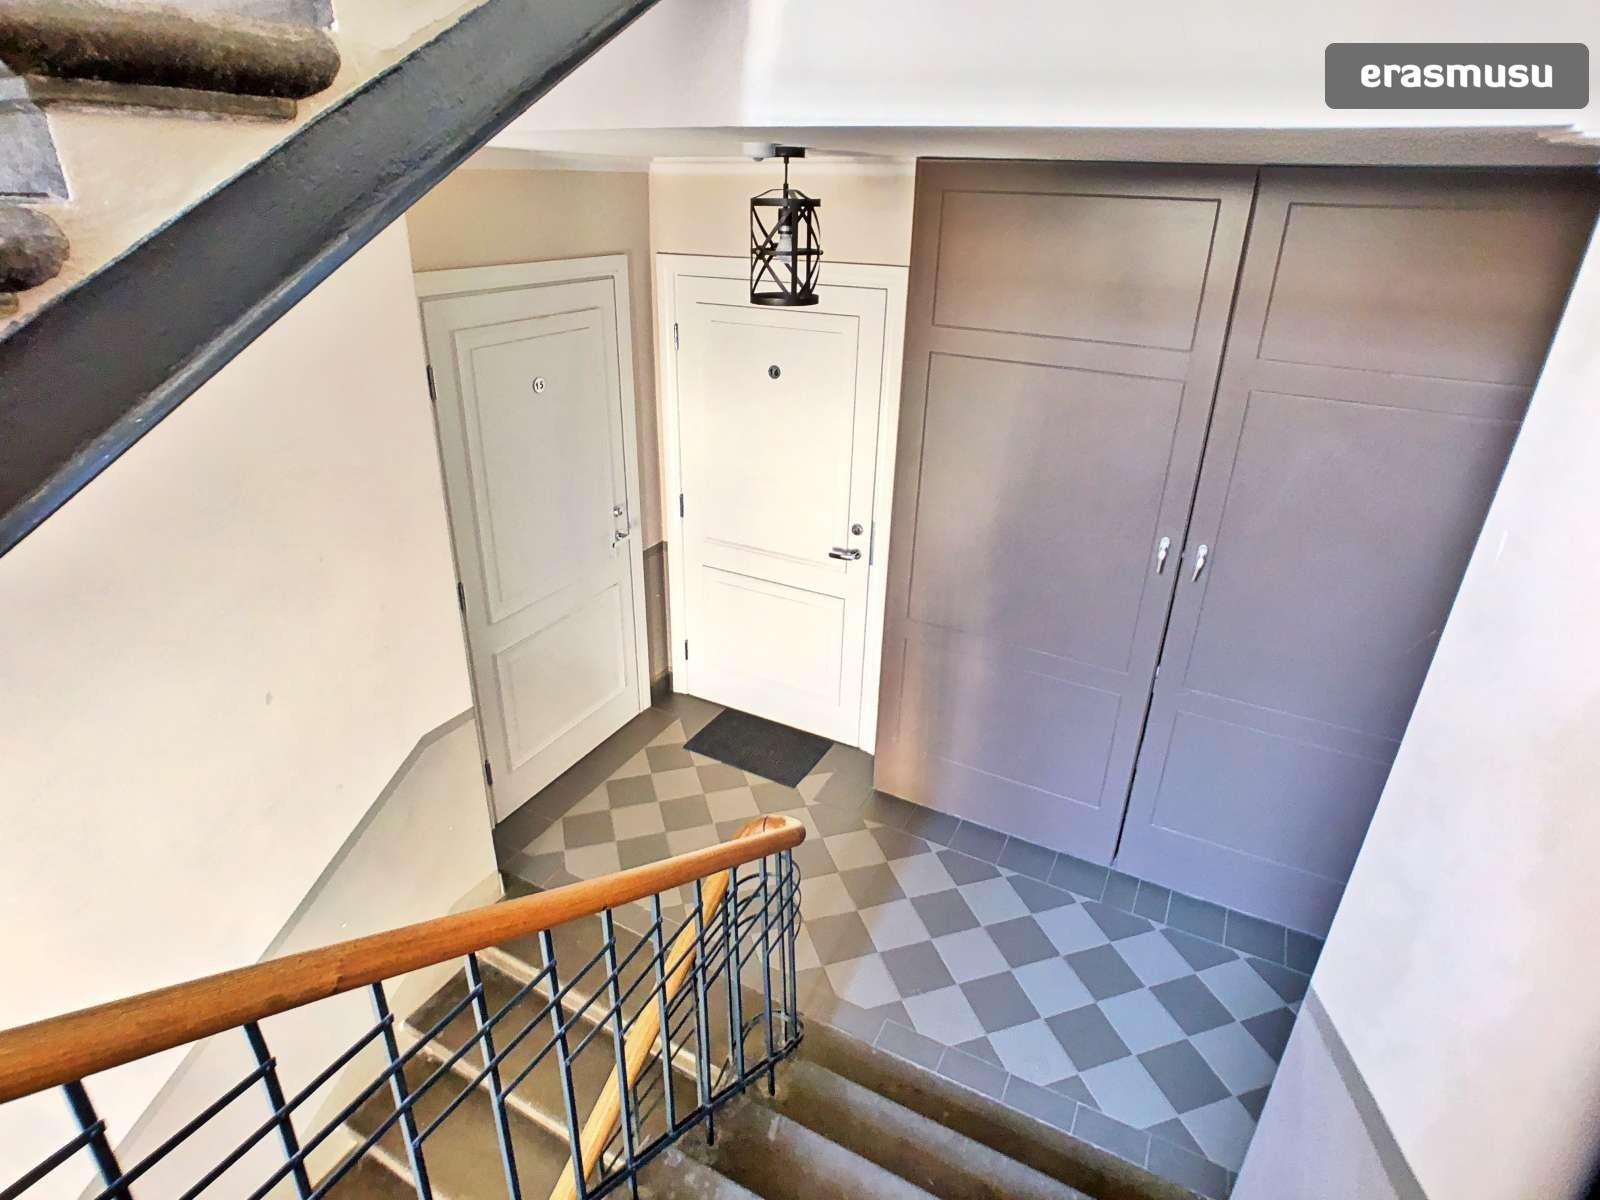 stylish-studio-apartment-rent-grizinkalns-66c7adba84e5e5f2cfe1d4